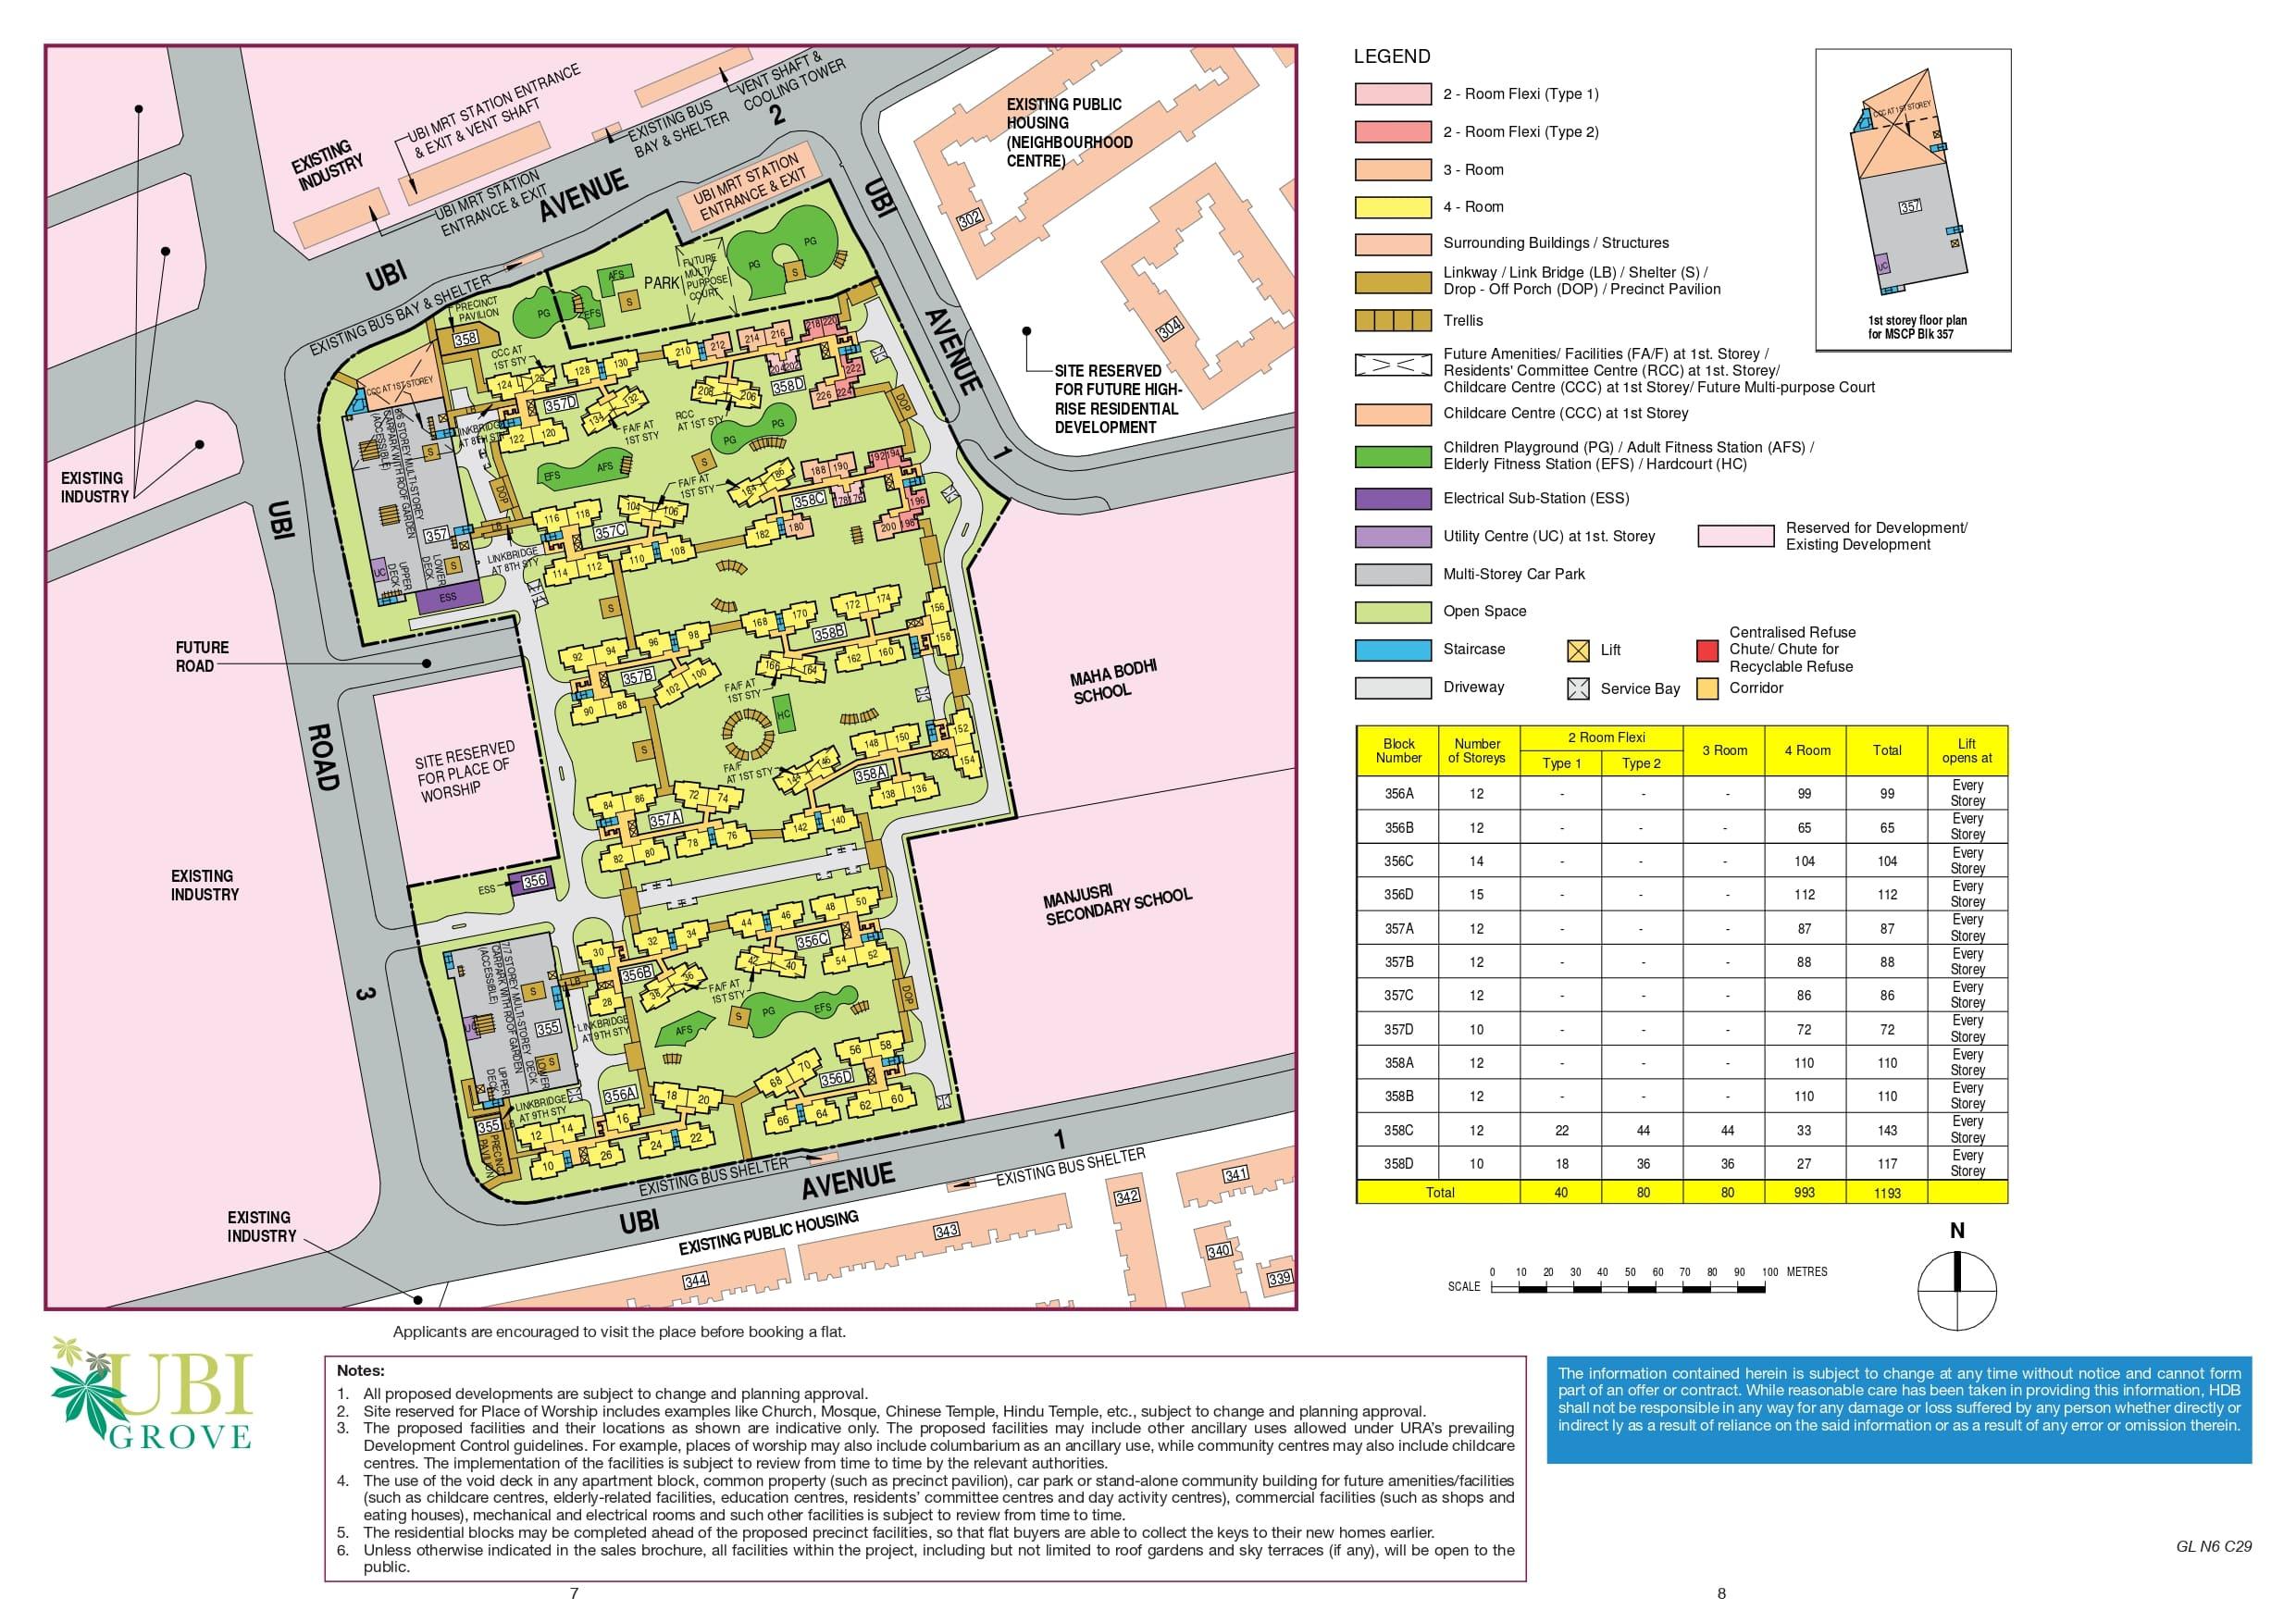 Ubi Grove Site Plan